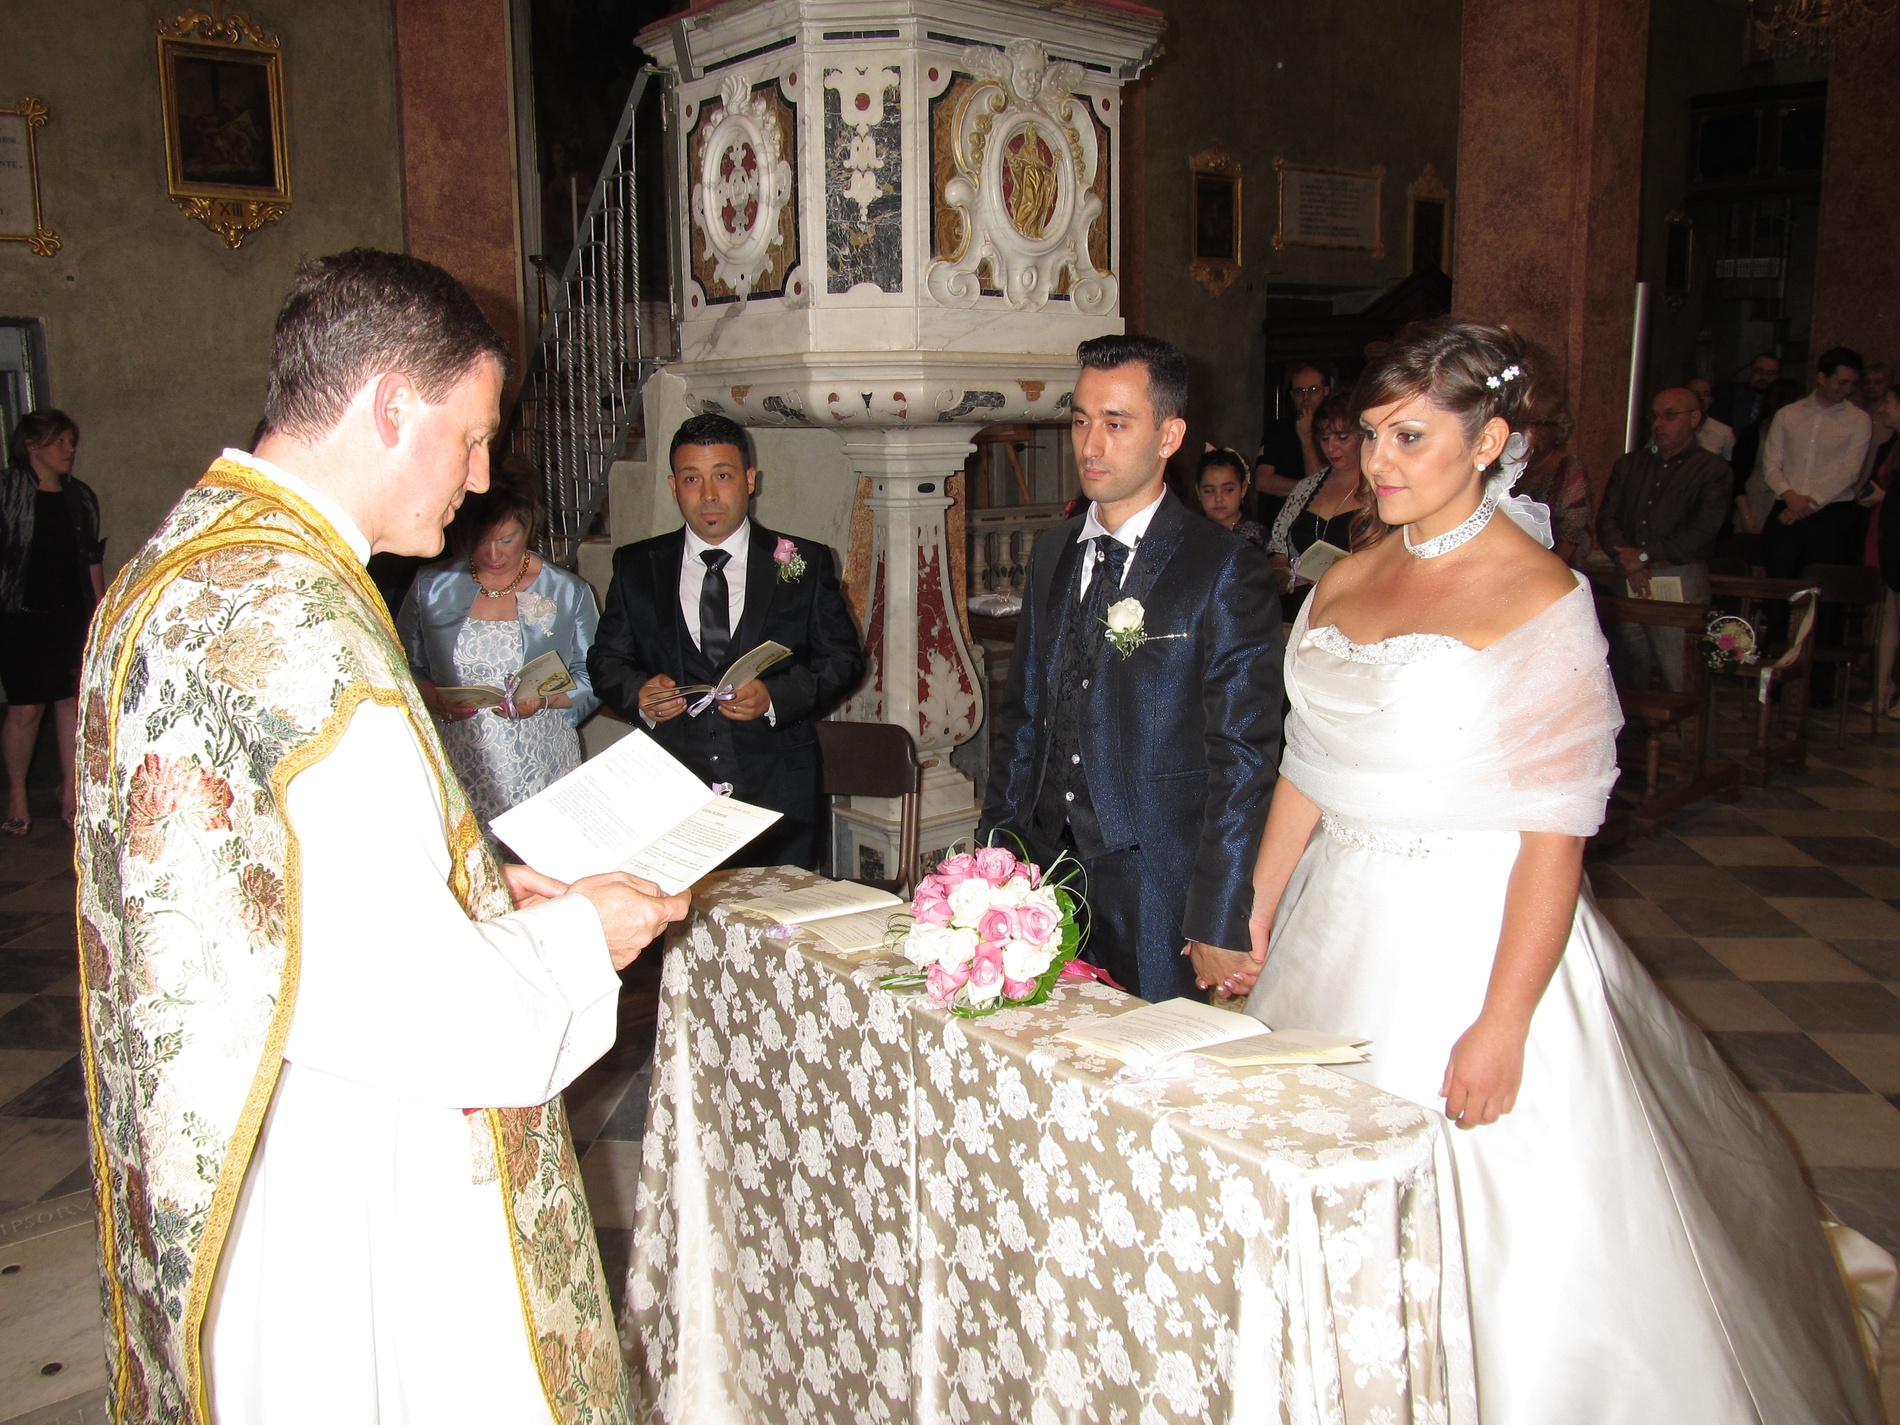 matrimonio-vicari-scino-2015-06-20-11-01-13